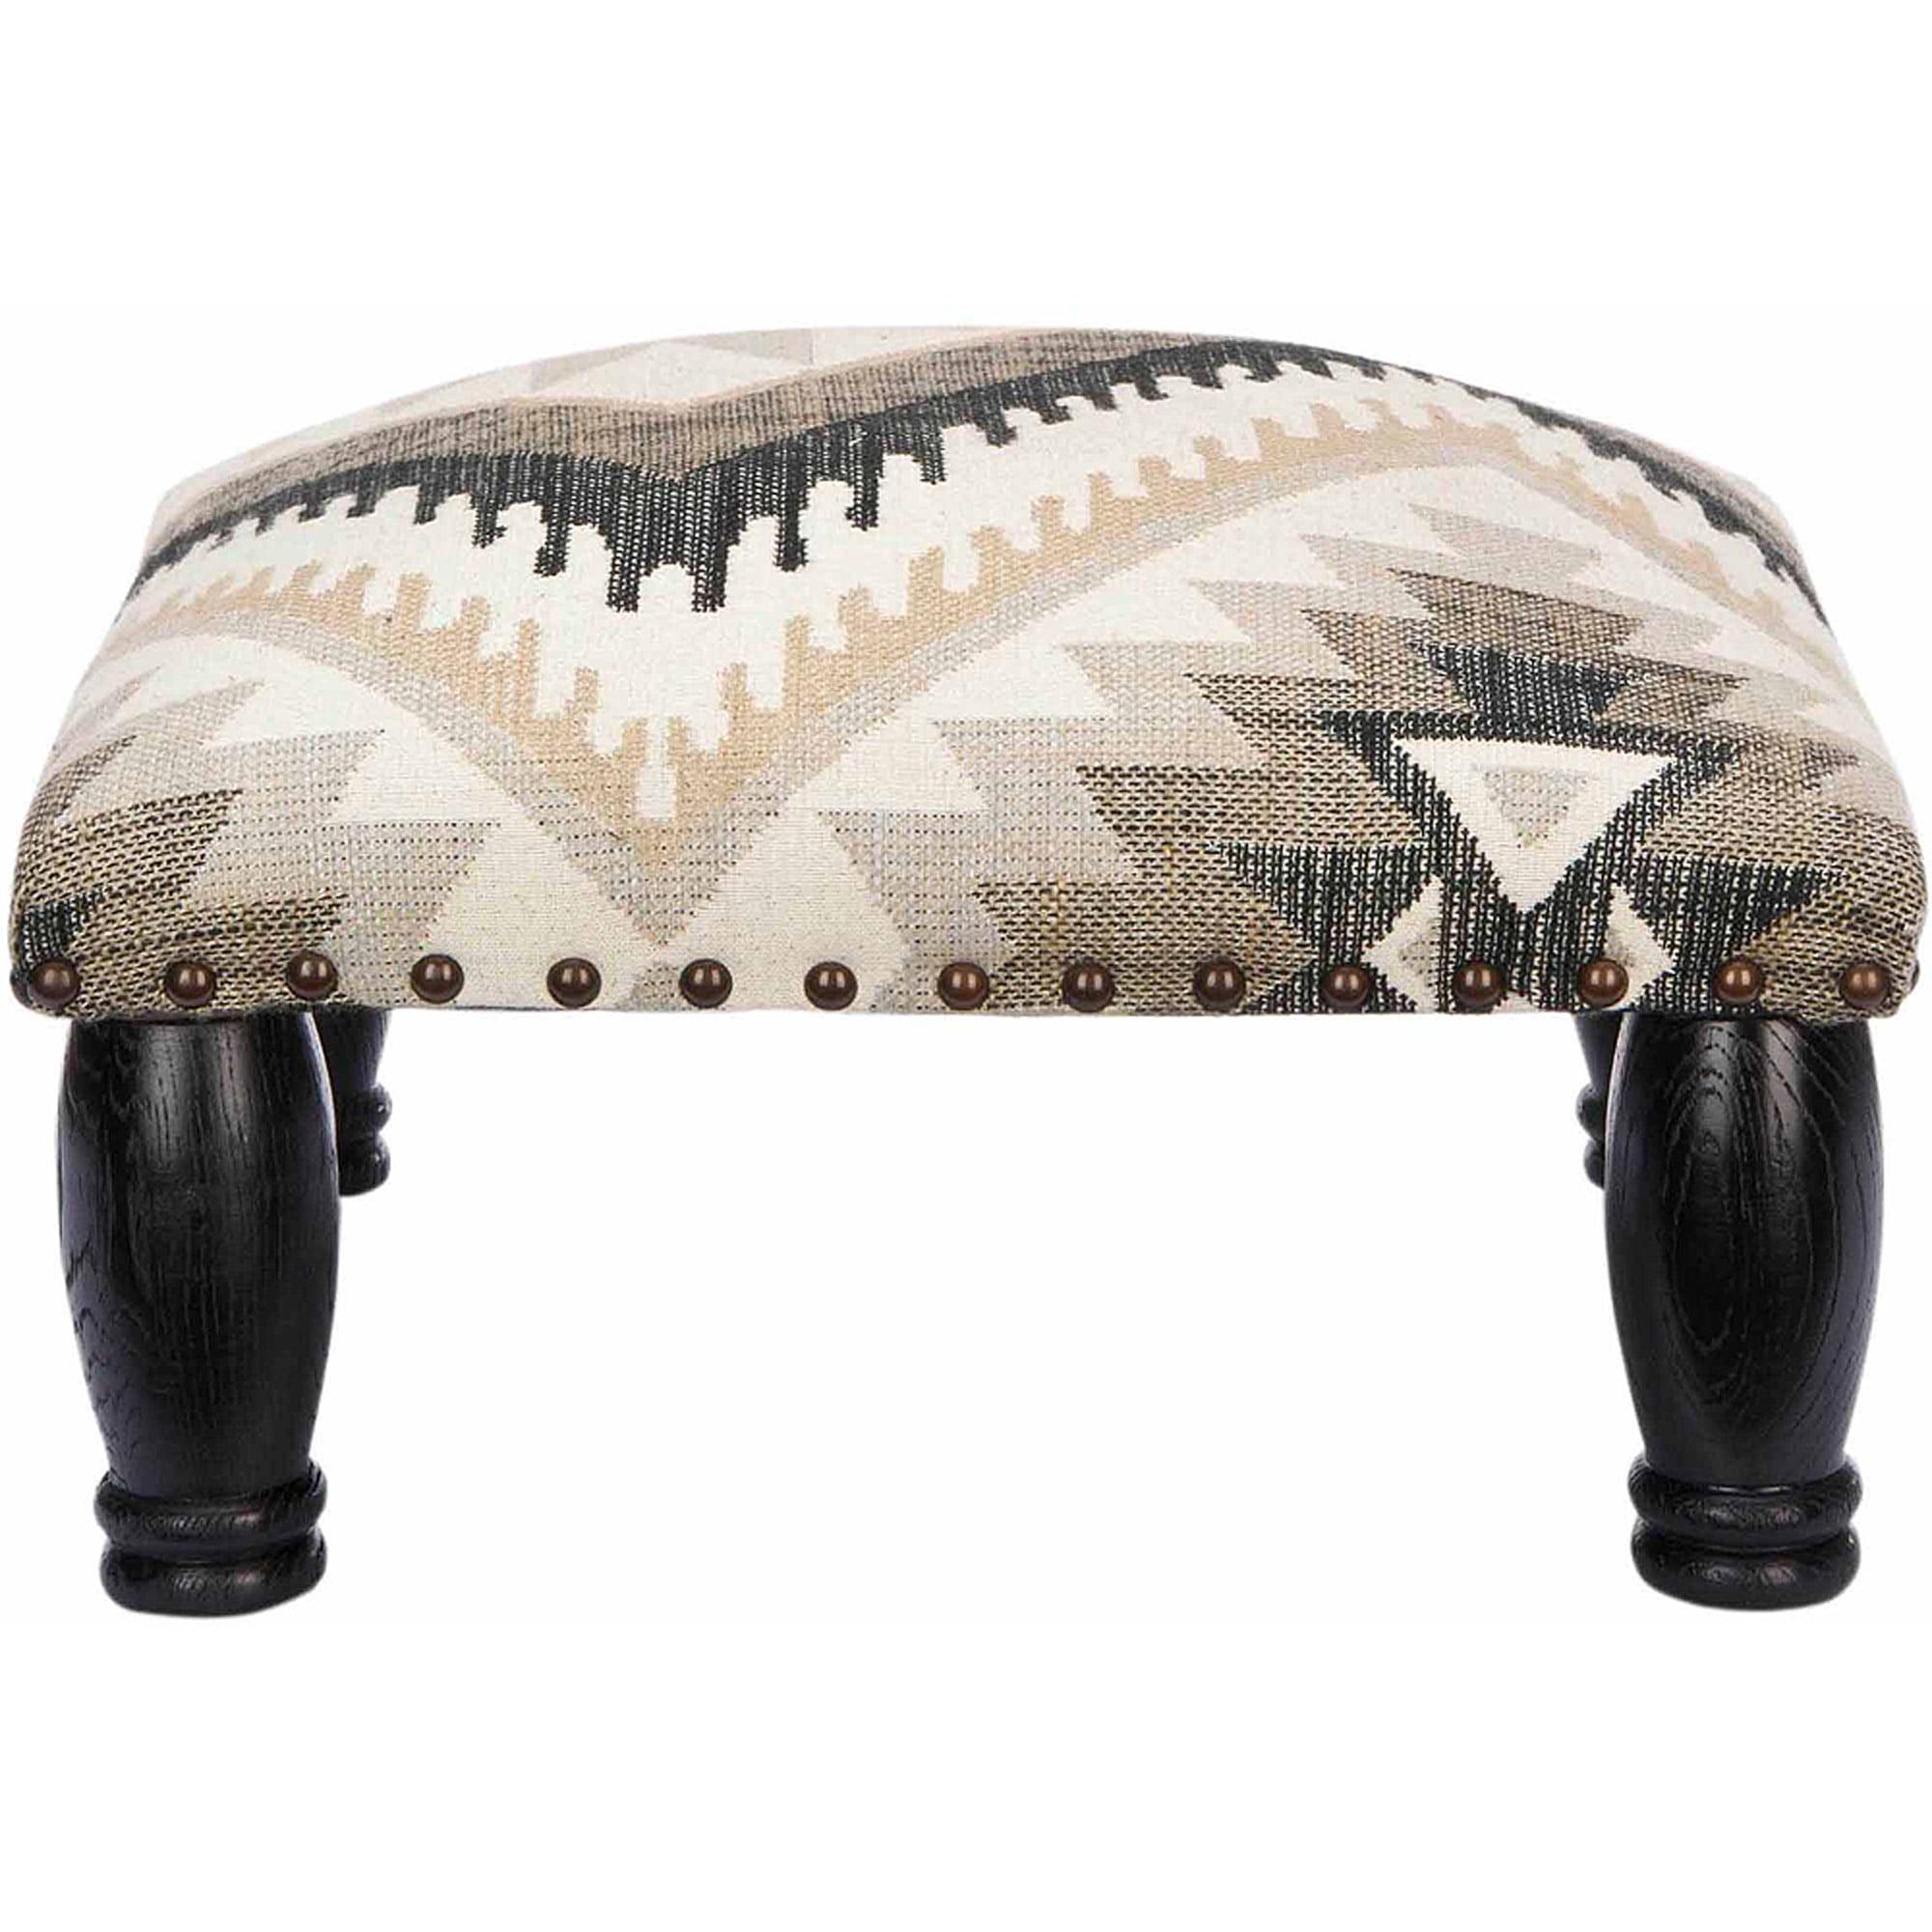 Safavieh Makalo Ottoman, Tribal Design with Brass Nail Heads